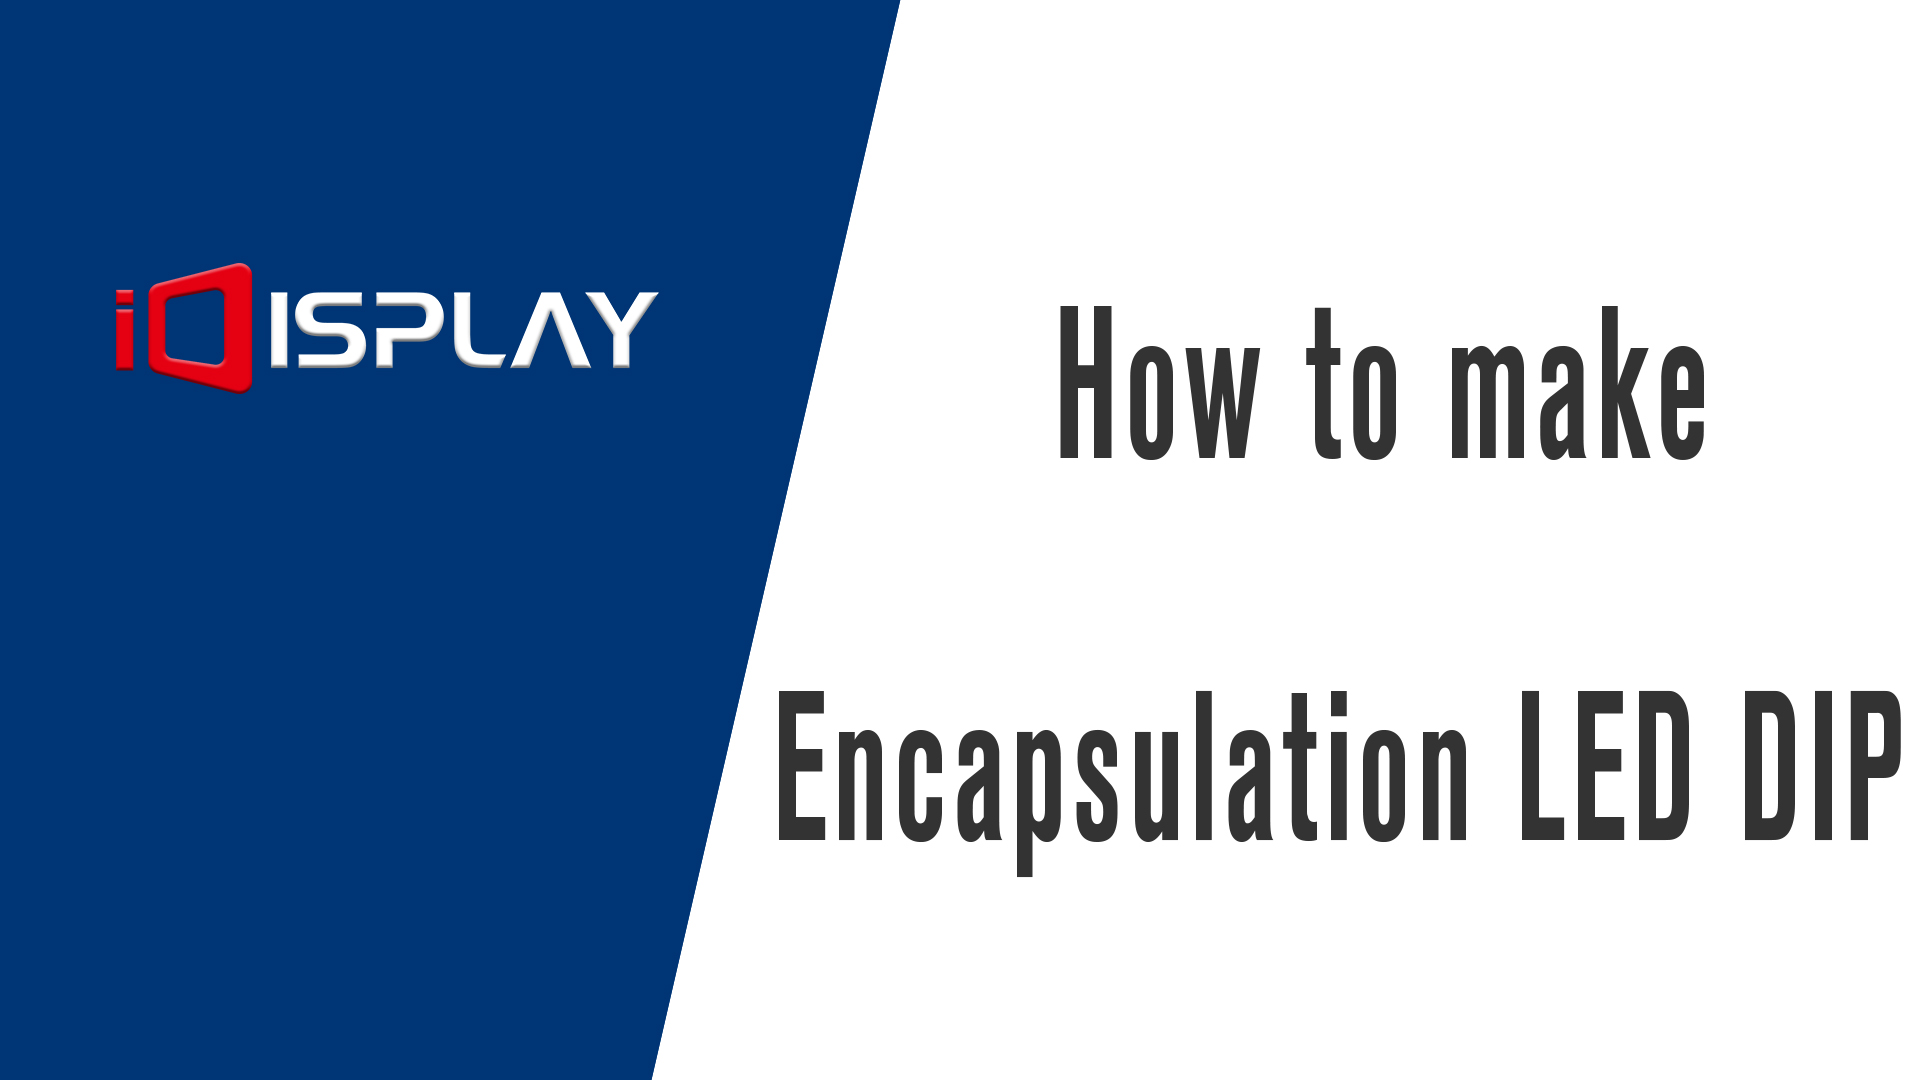 How to make encapsulation of led DIP - Shenzhen iDisplay technology Co., Ltd